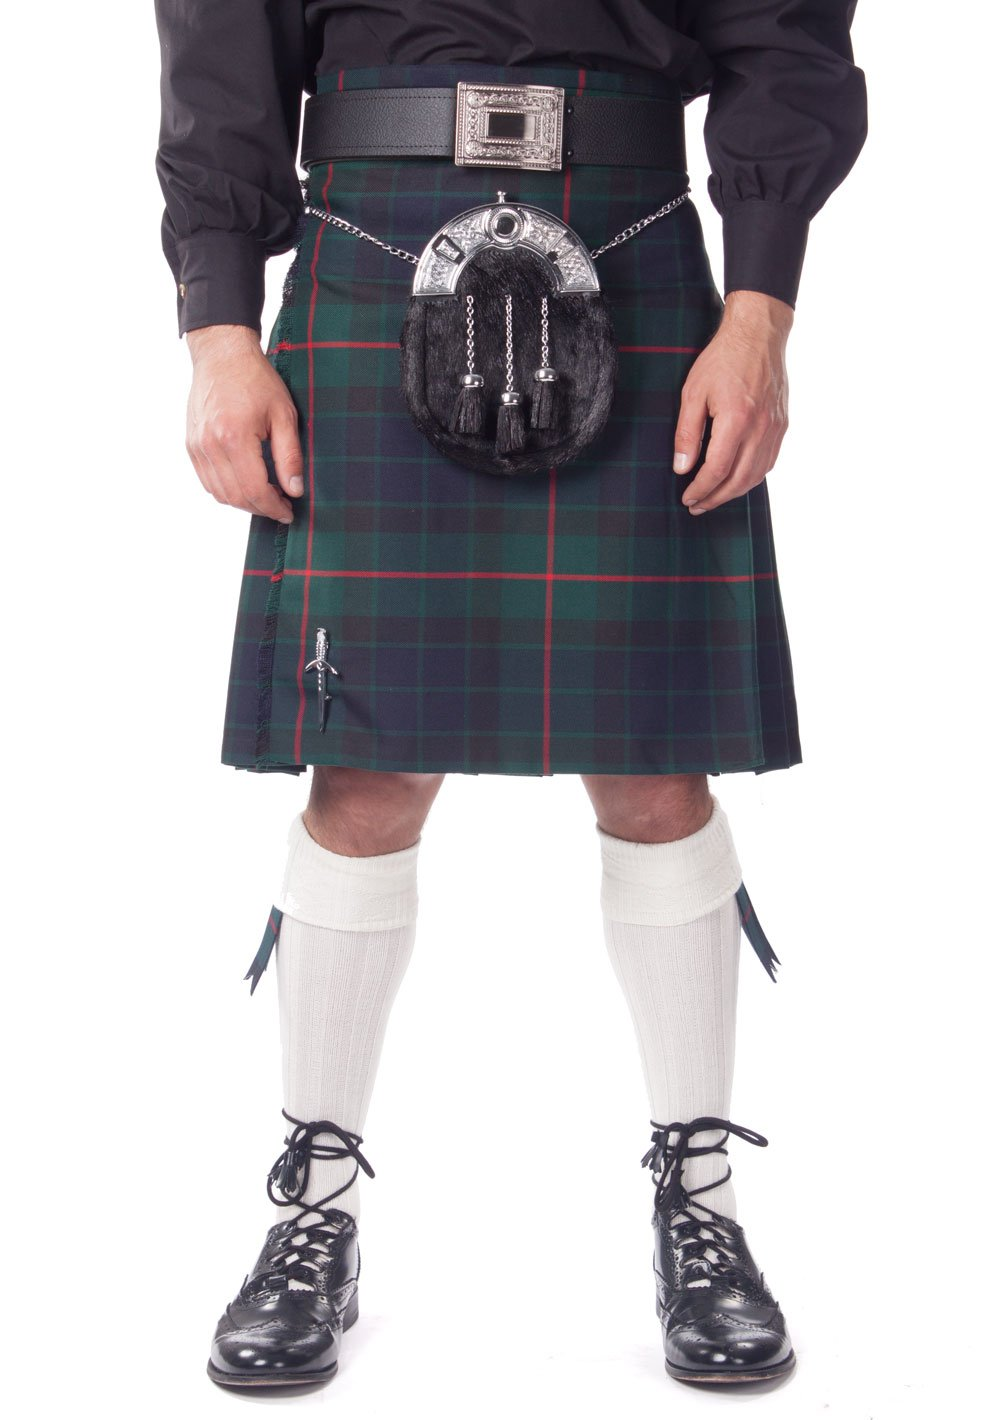 Kilt Society Mens 7 Piece Full Dress Kilt Outfit- Gunn Tartan with White Hose 42'' to 46''